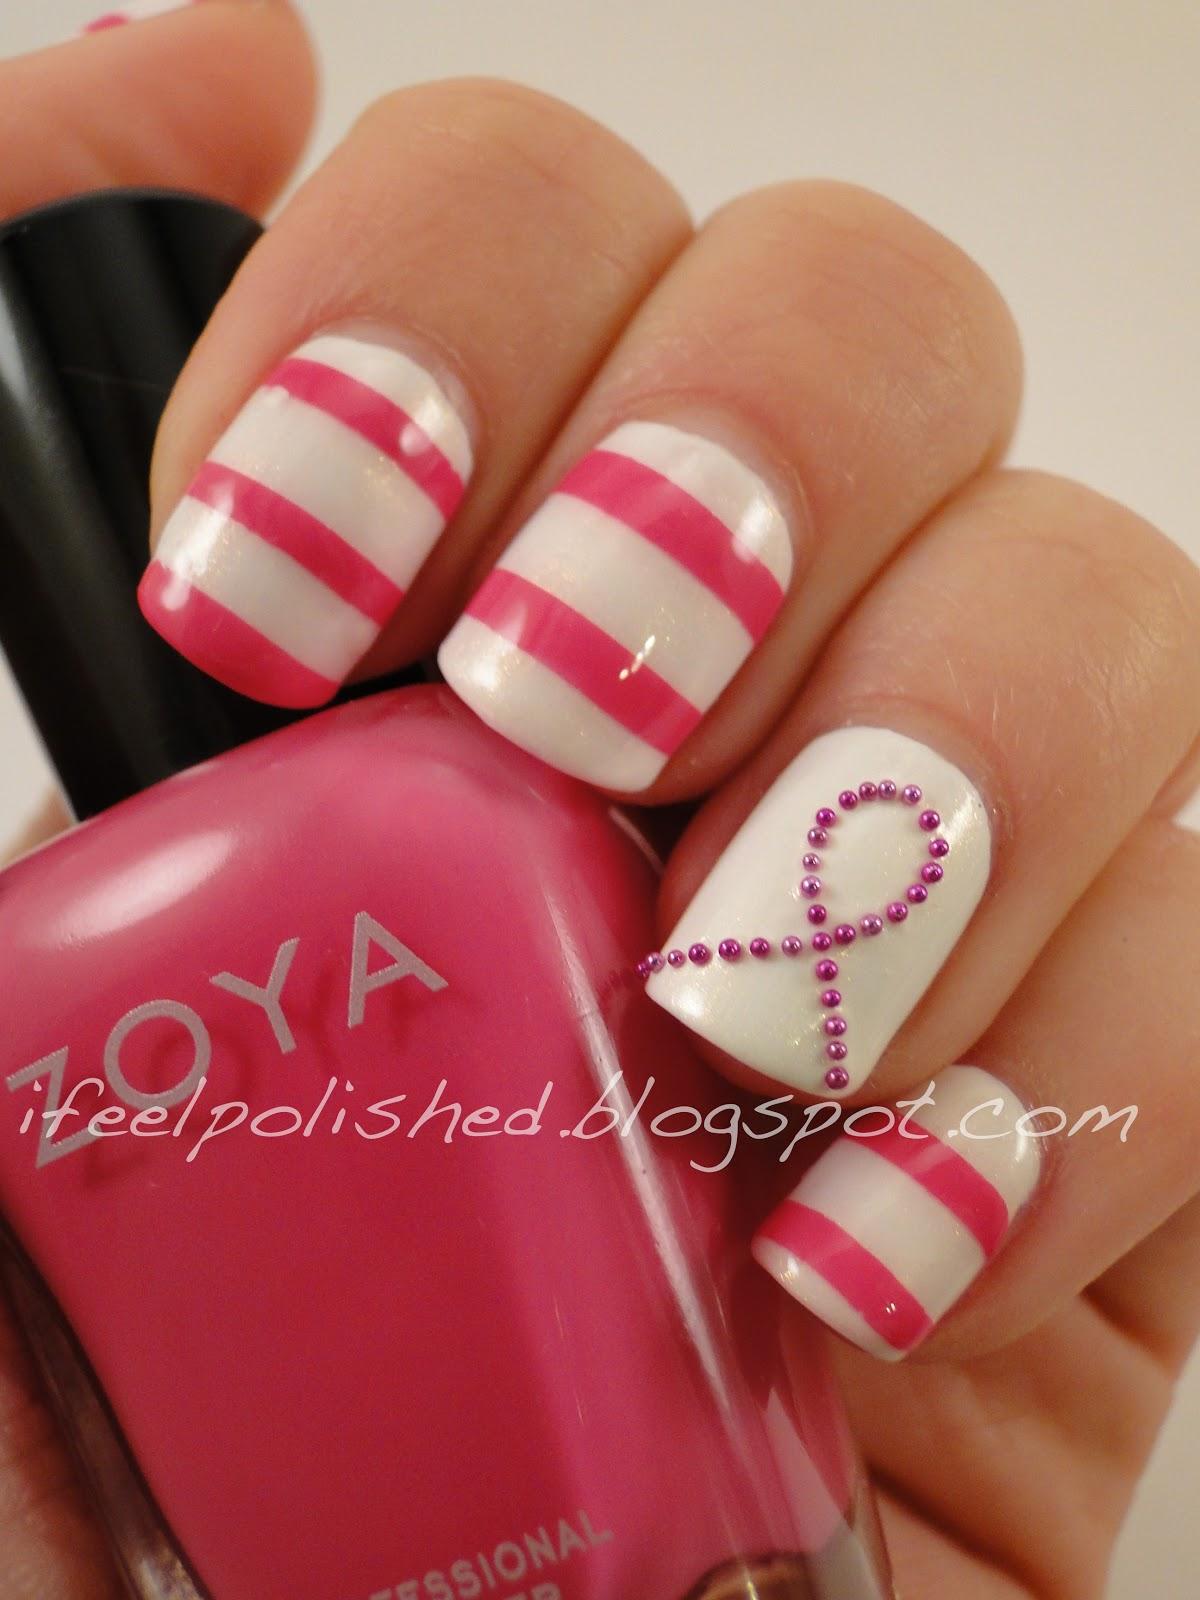 I Feel Polished!: Breast Cancer Awareness Nails: Take Four